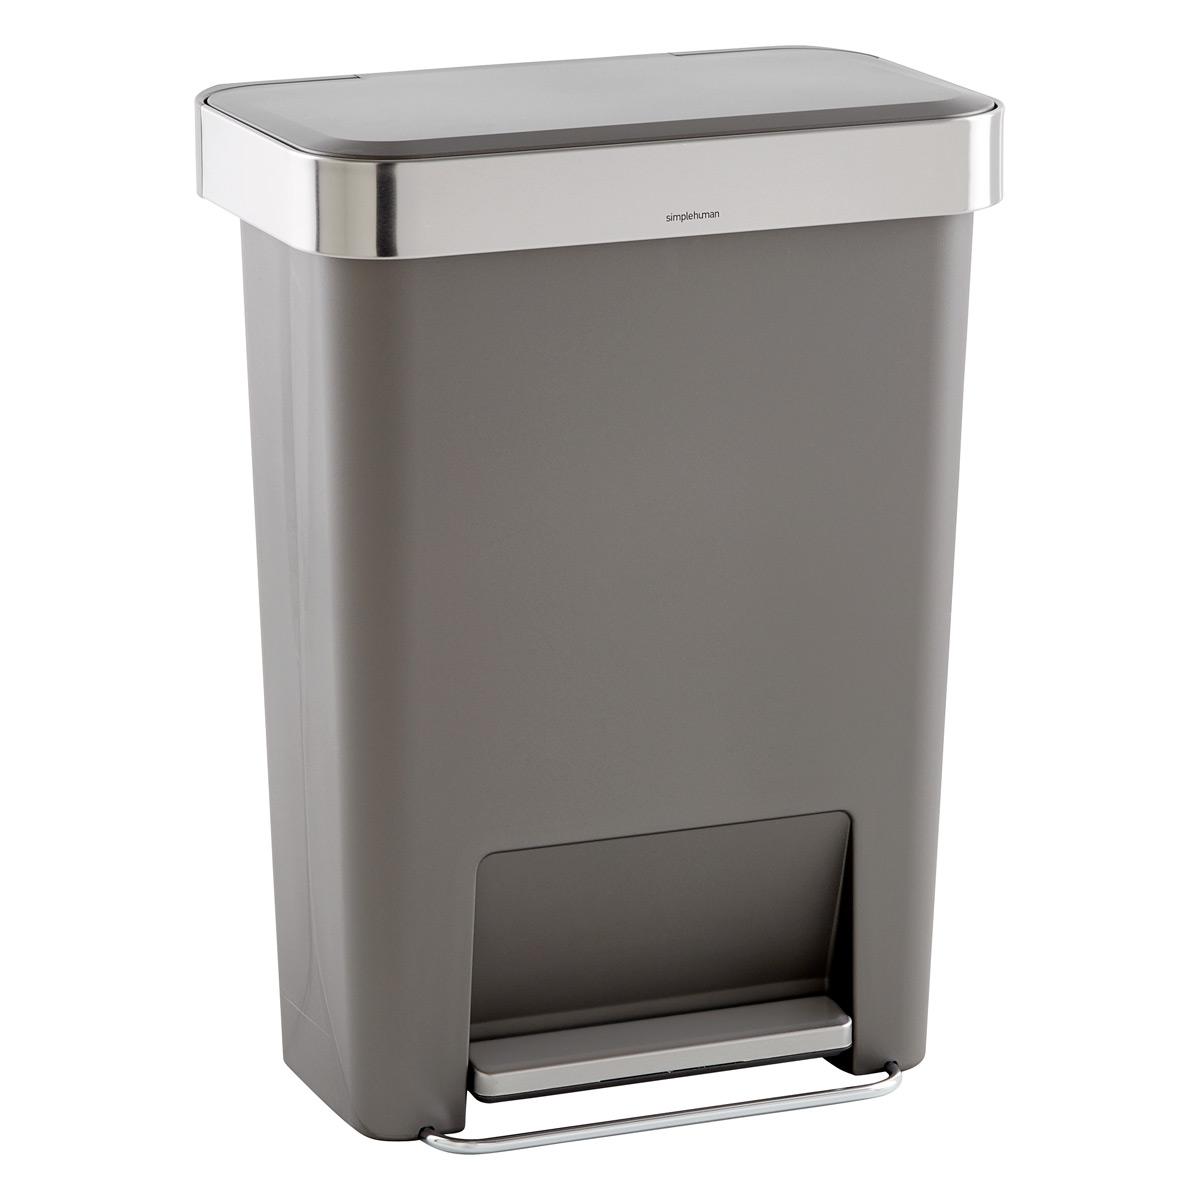 rectangular trash can with liner pocket